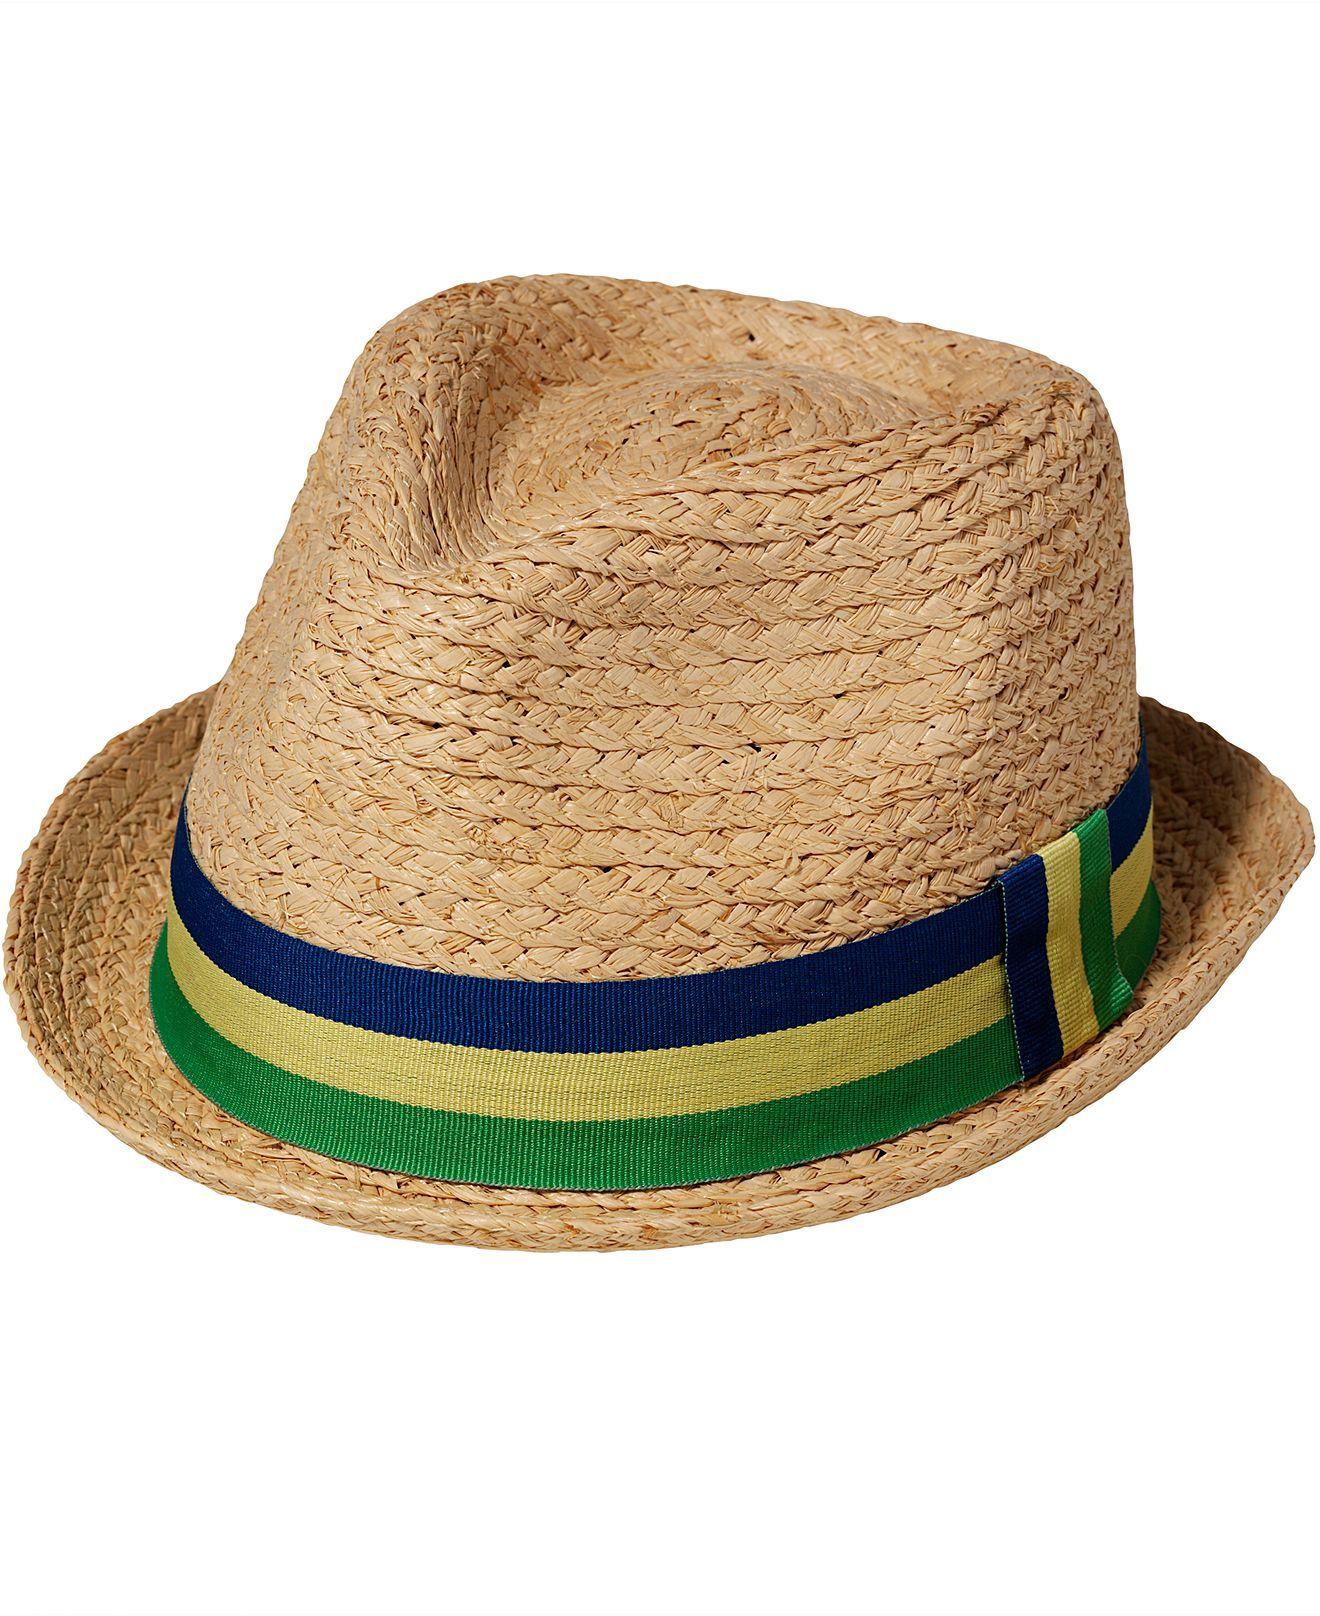 1e59b0737 Block Hats, Braided Raffia Fedora Brazil - Mens Hats, Gloves ...